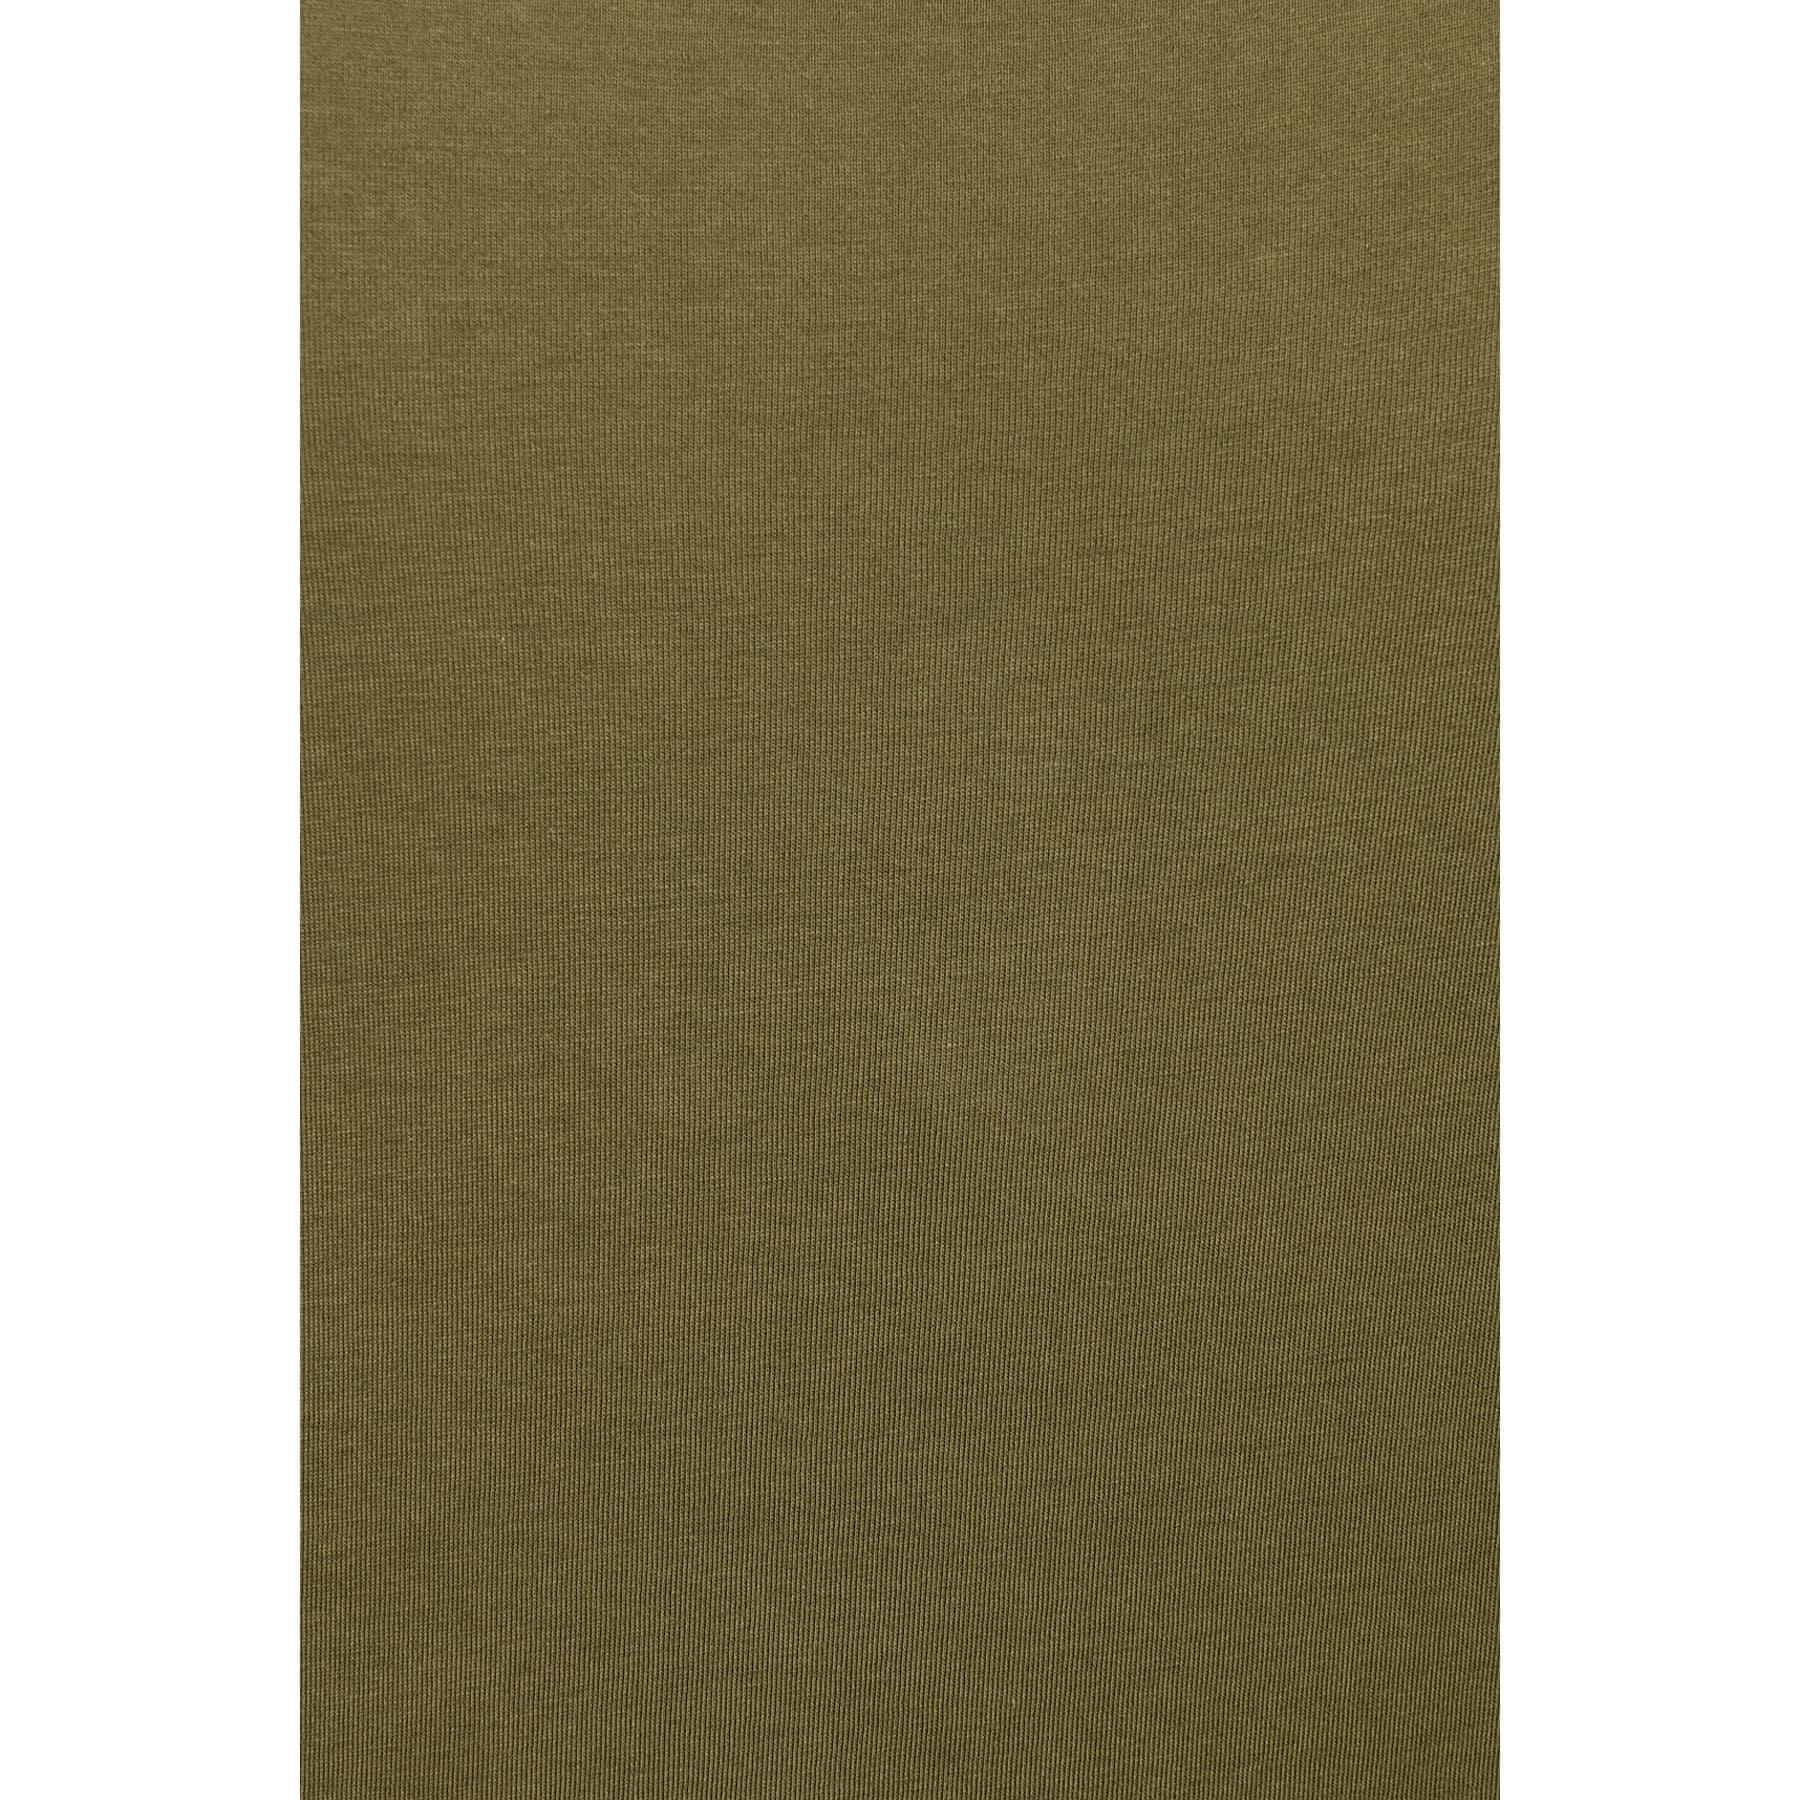 Kisa Kol Basic Penye Zeytin Yeşili